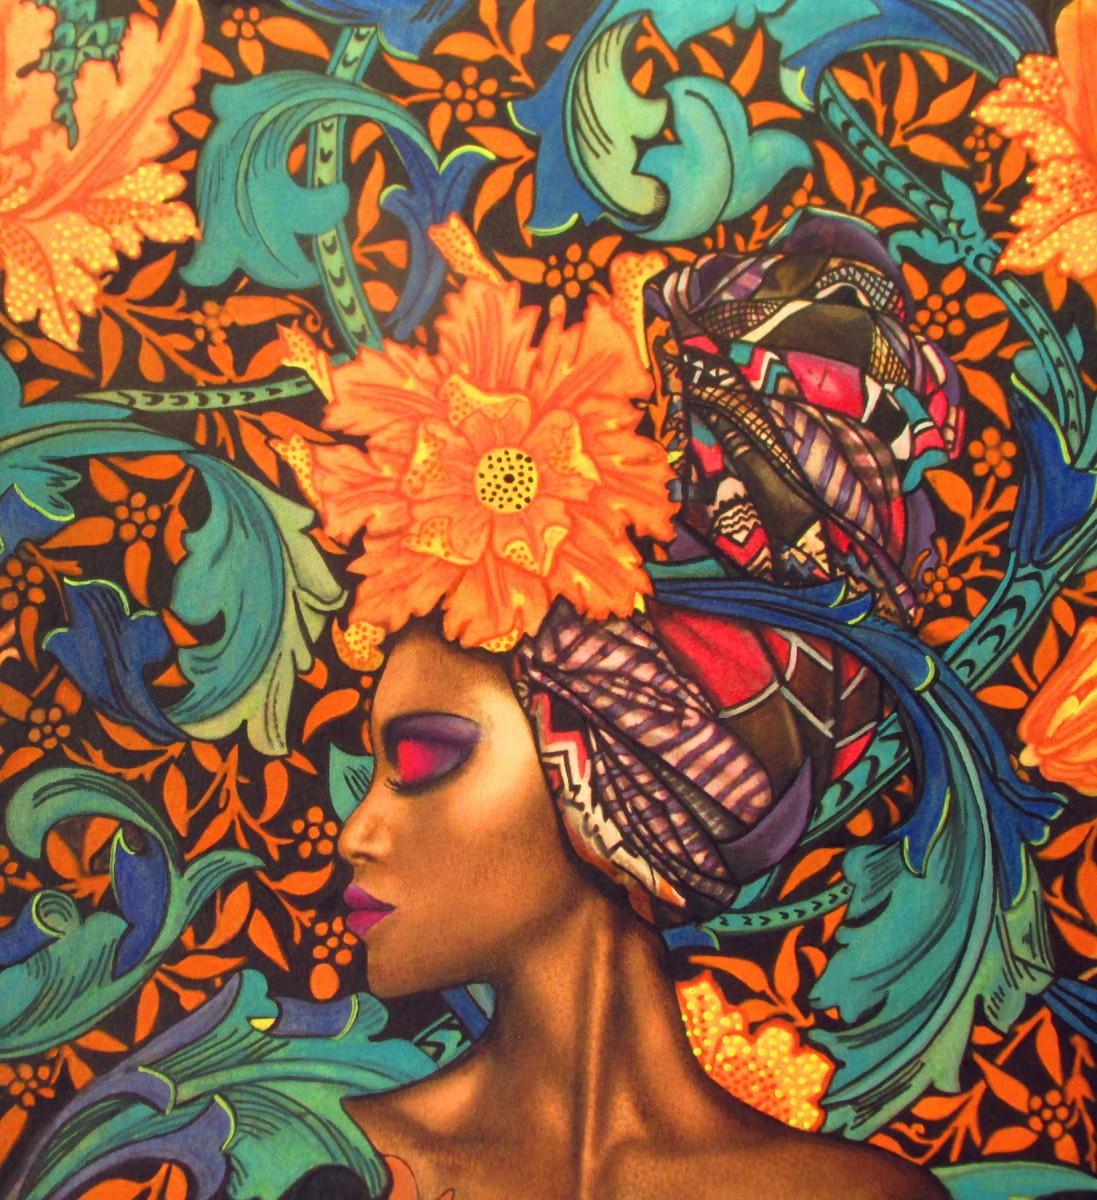 Art Exhibit - In Honor Of Black History